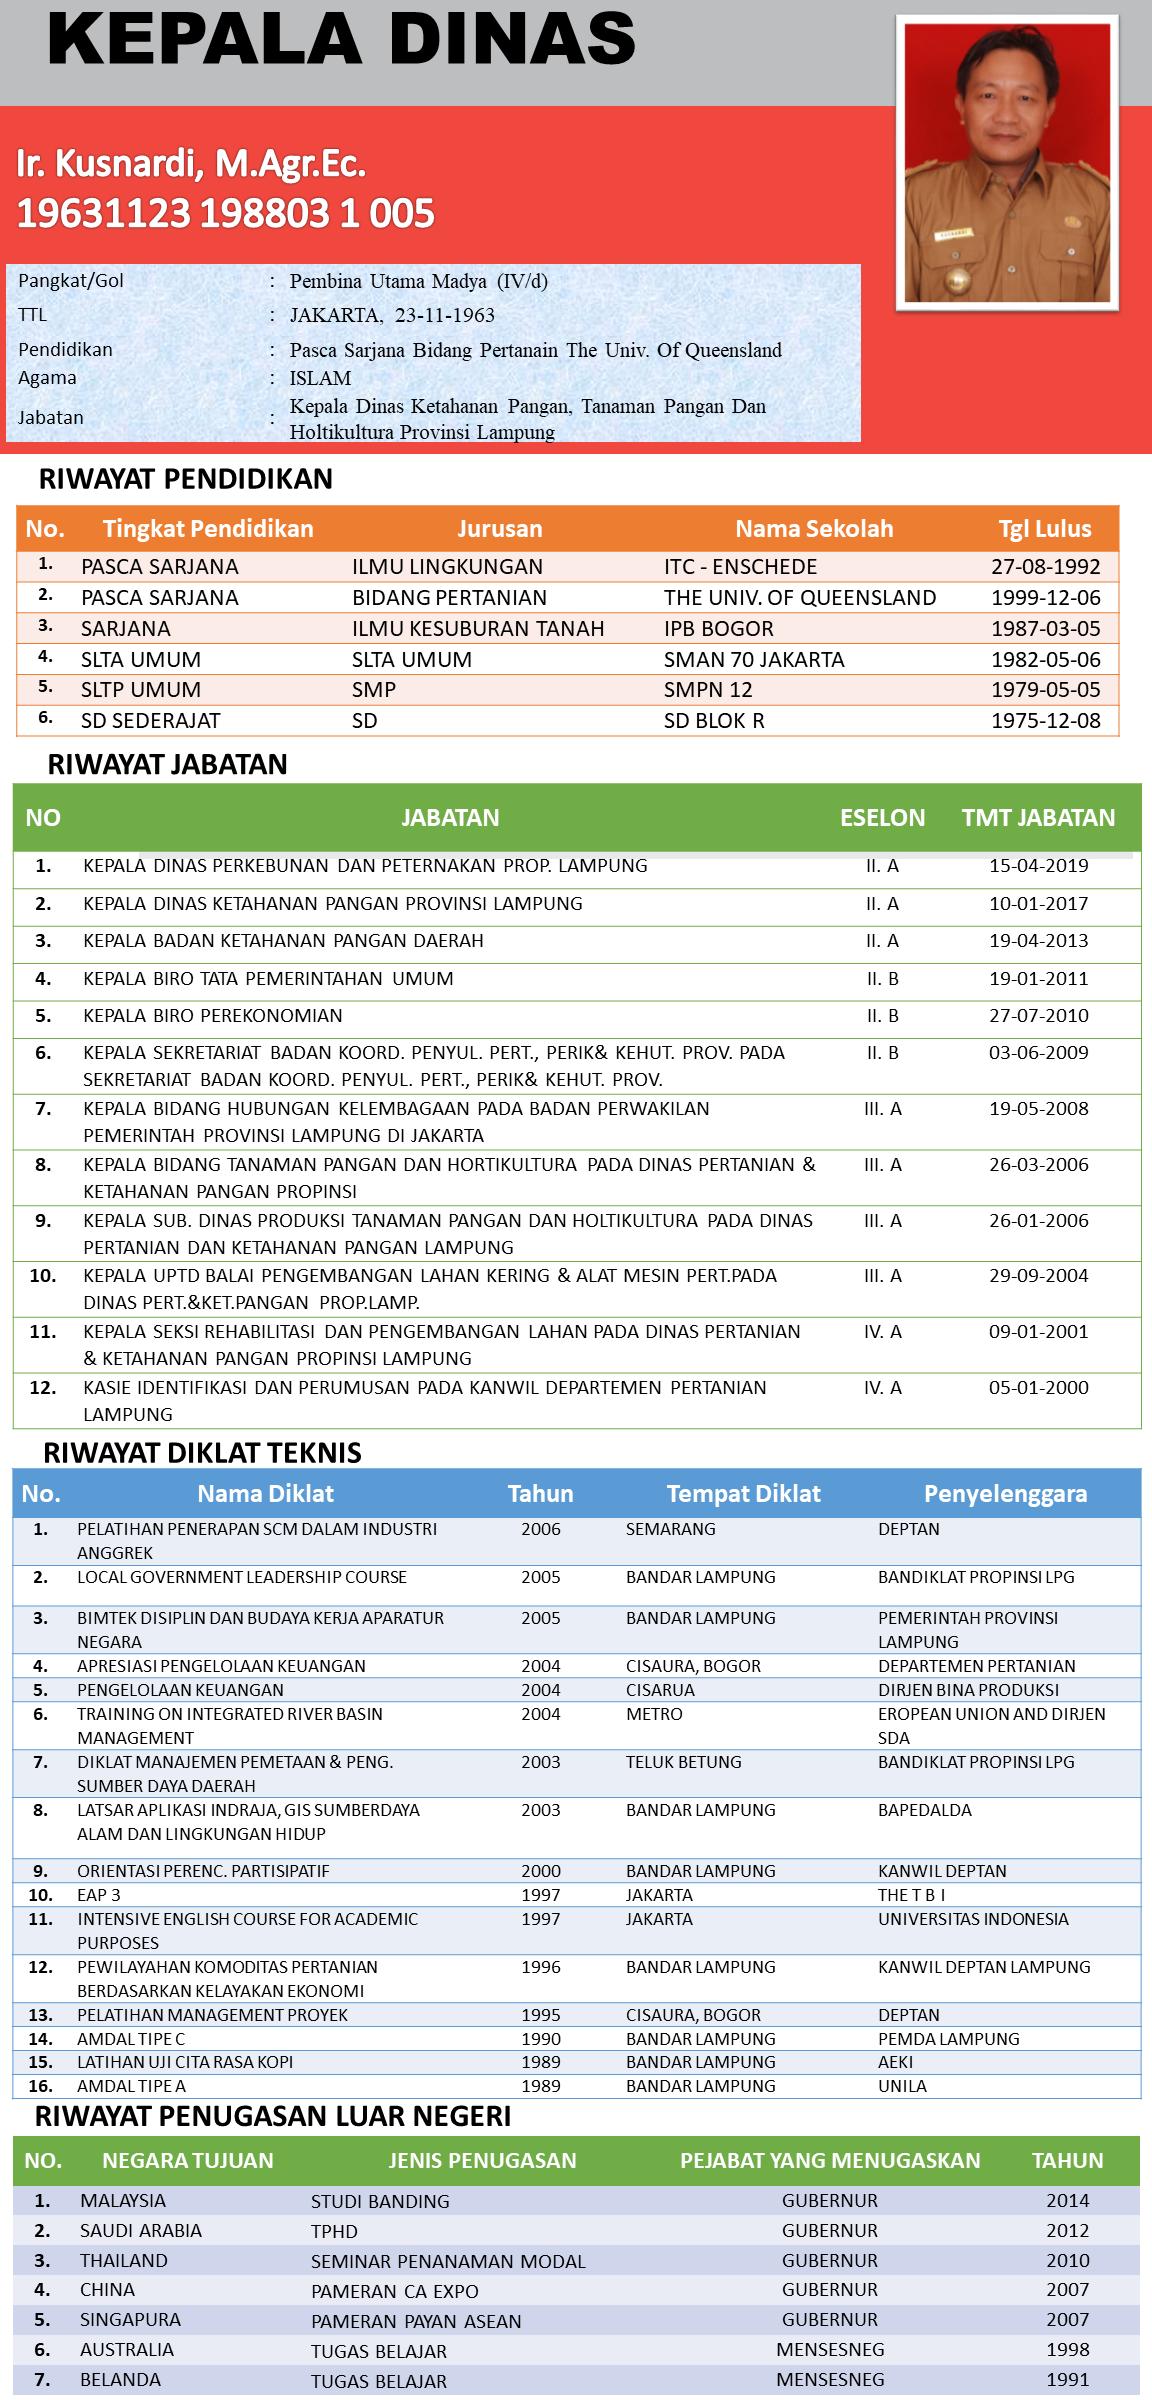 Profil Kepala Dinas TPH Kusnardi